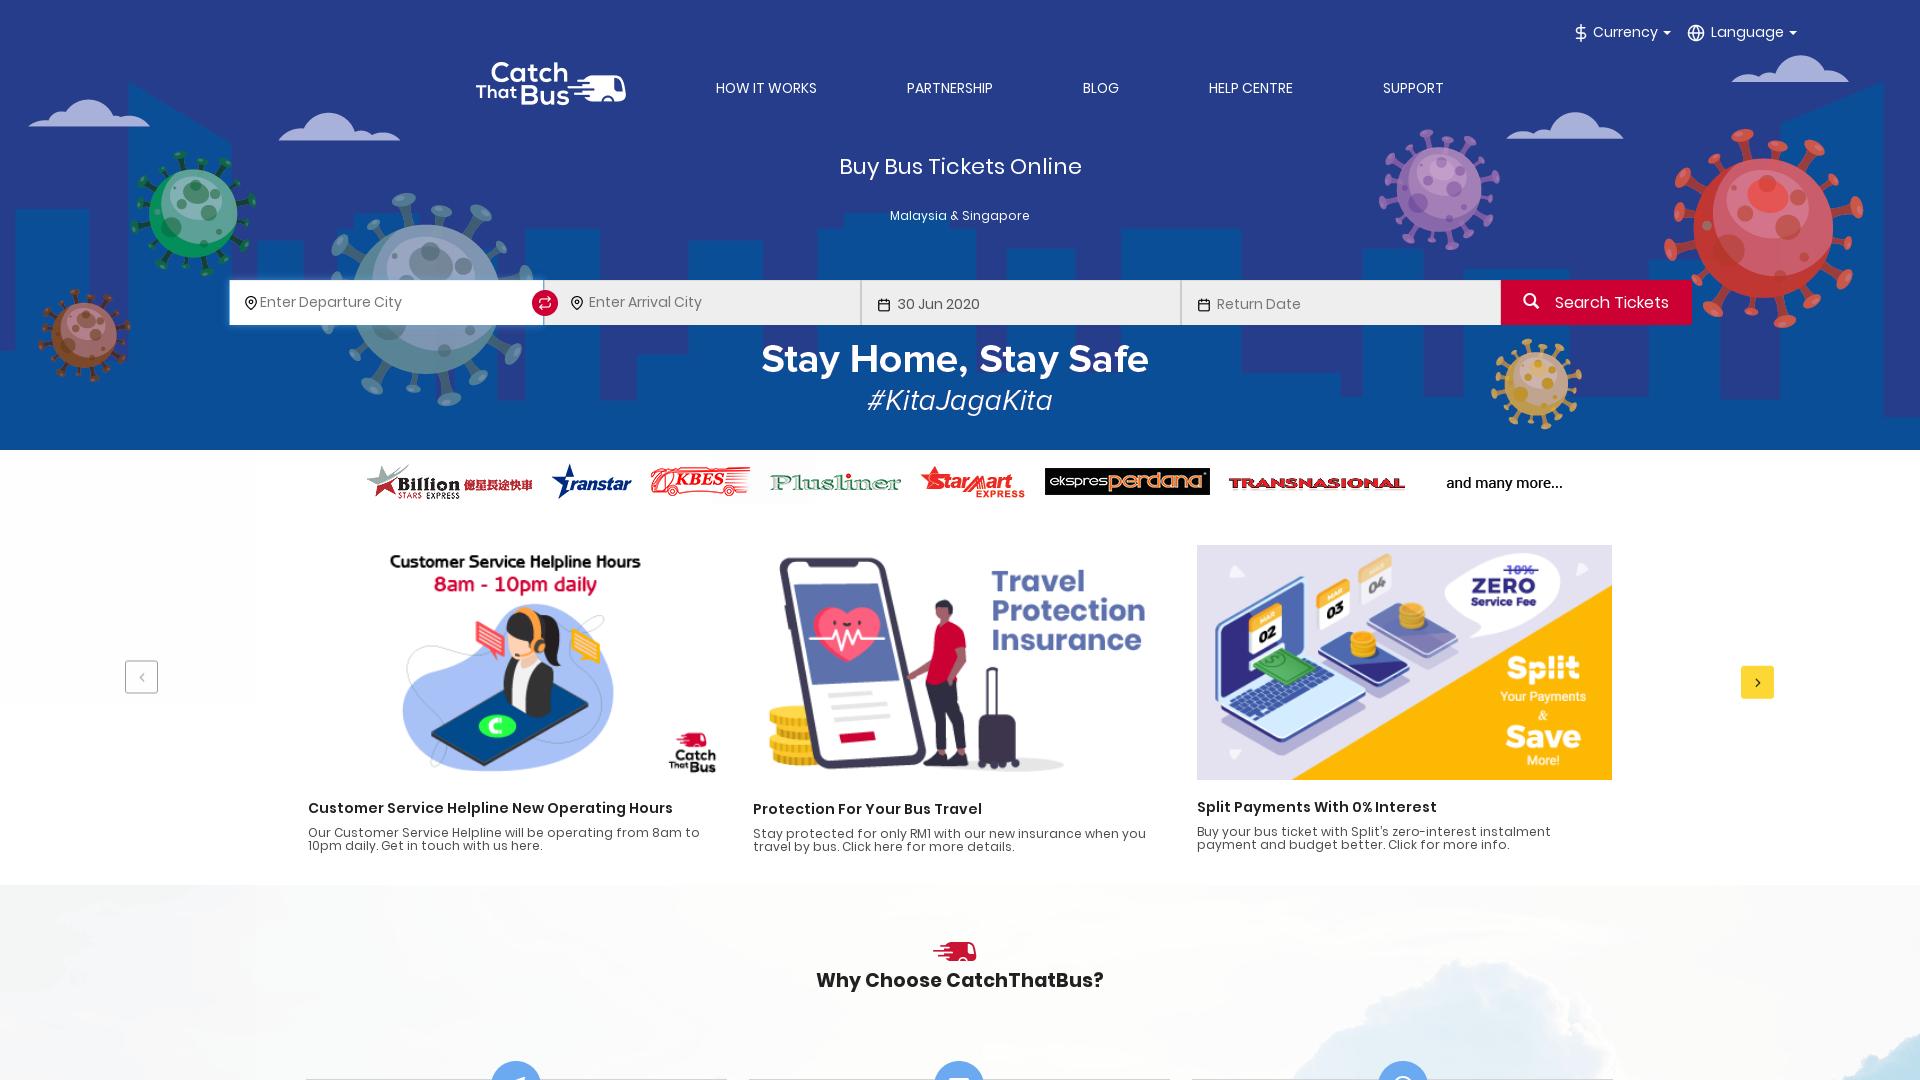 CatchThatBus website